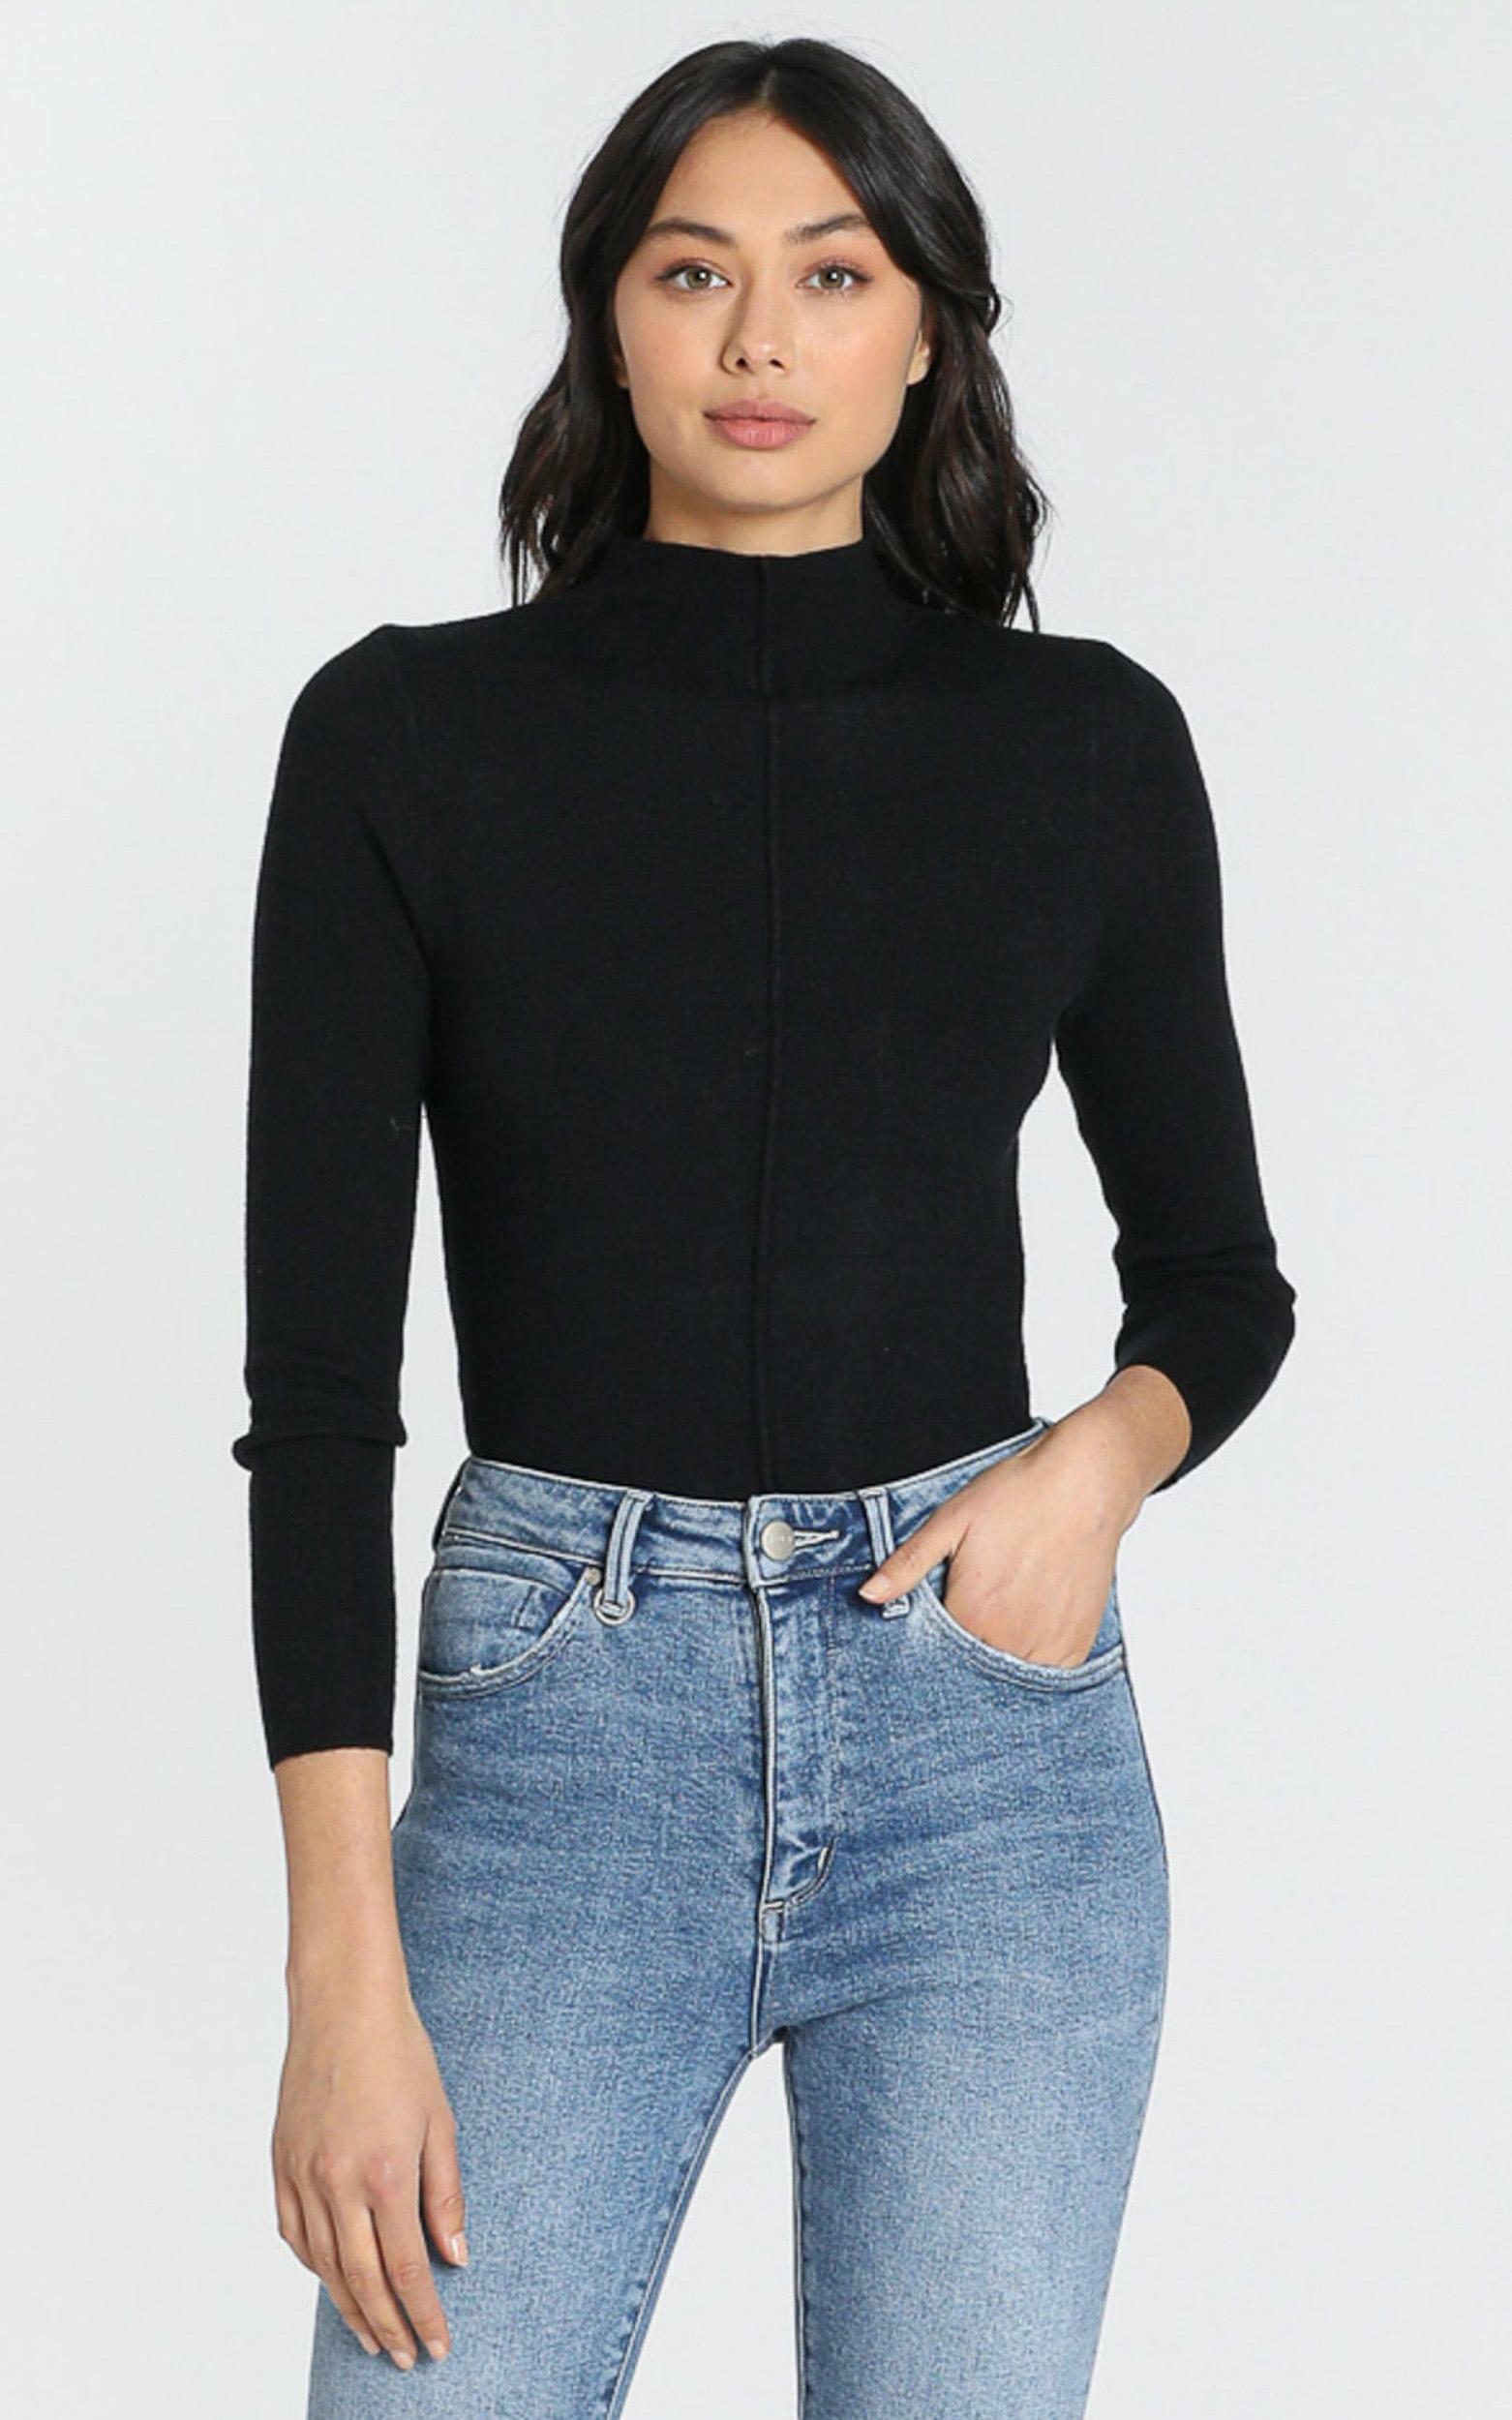 Camden Knit Top in black - S/M, BLK1, hi-res image number null